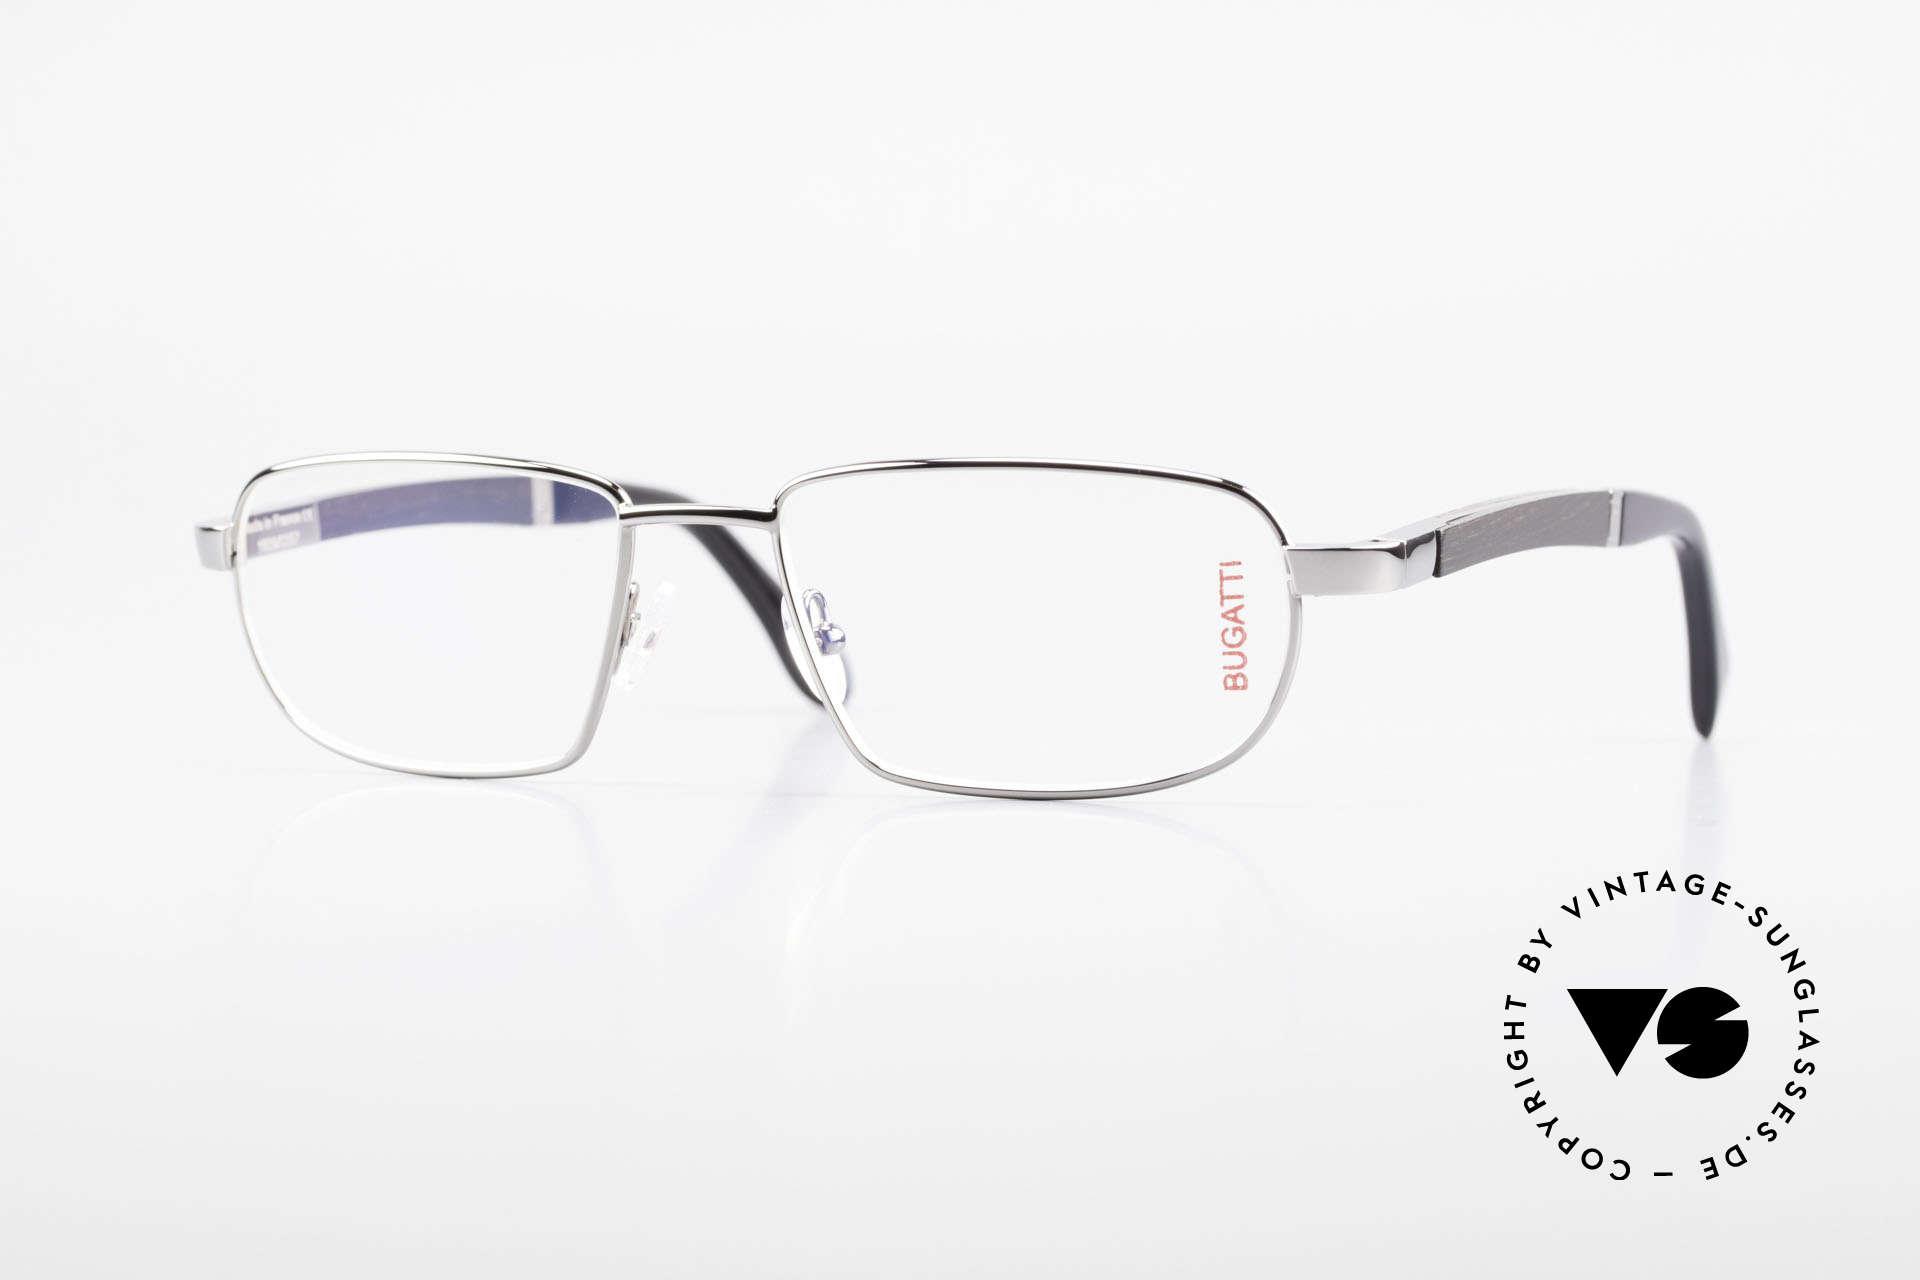 Bugatti 549 Ebony Wood Ruthenium Frame, BUGATTI luxury eyeglasses of incredible top-quality, Made for Men